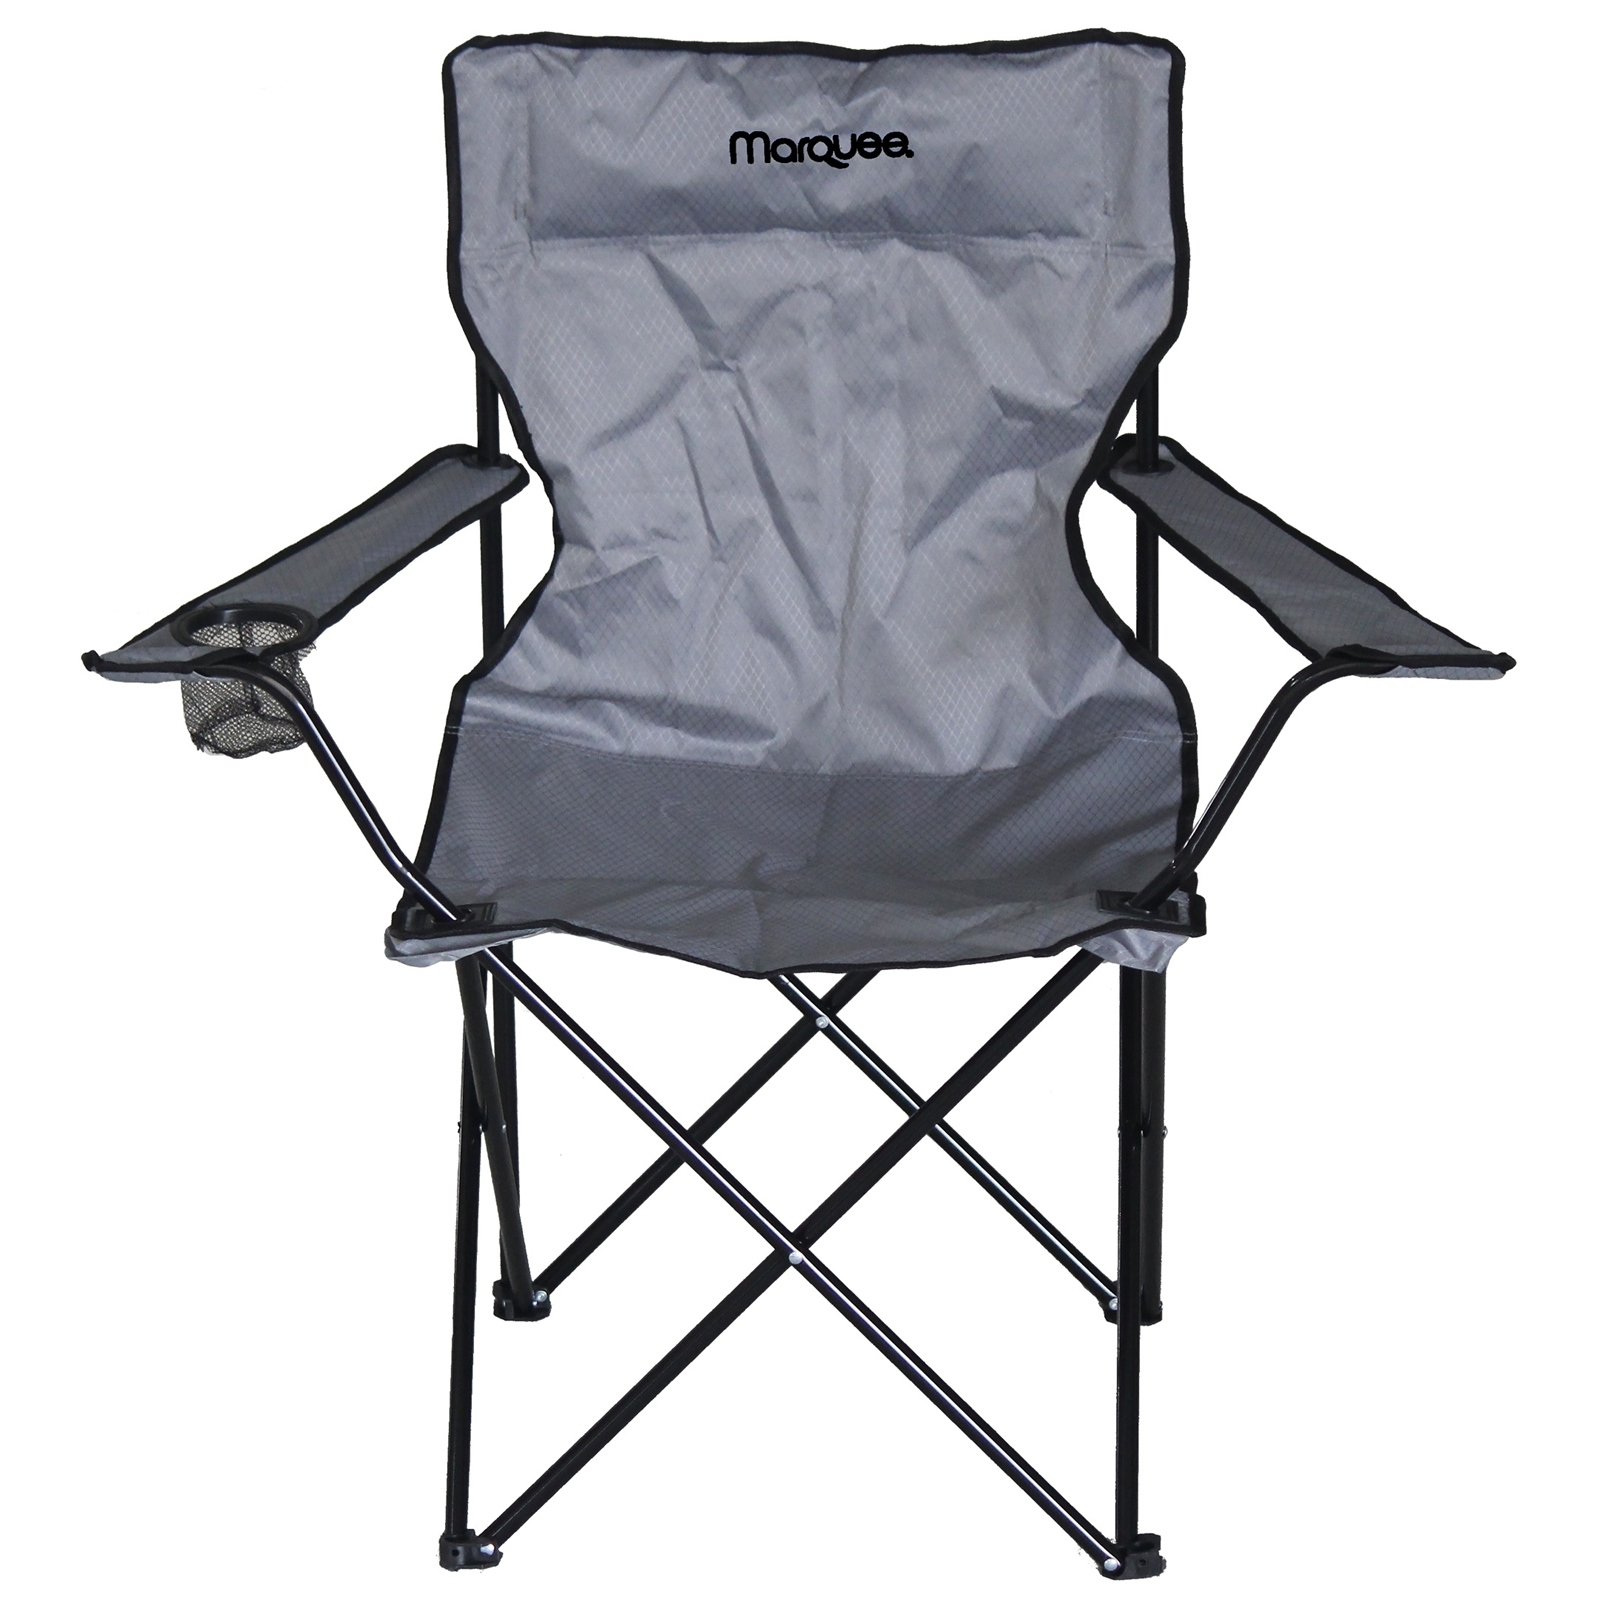 Marquee Adventurer Camp Chair - Grey